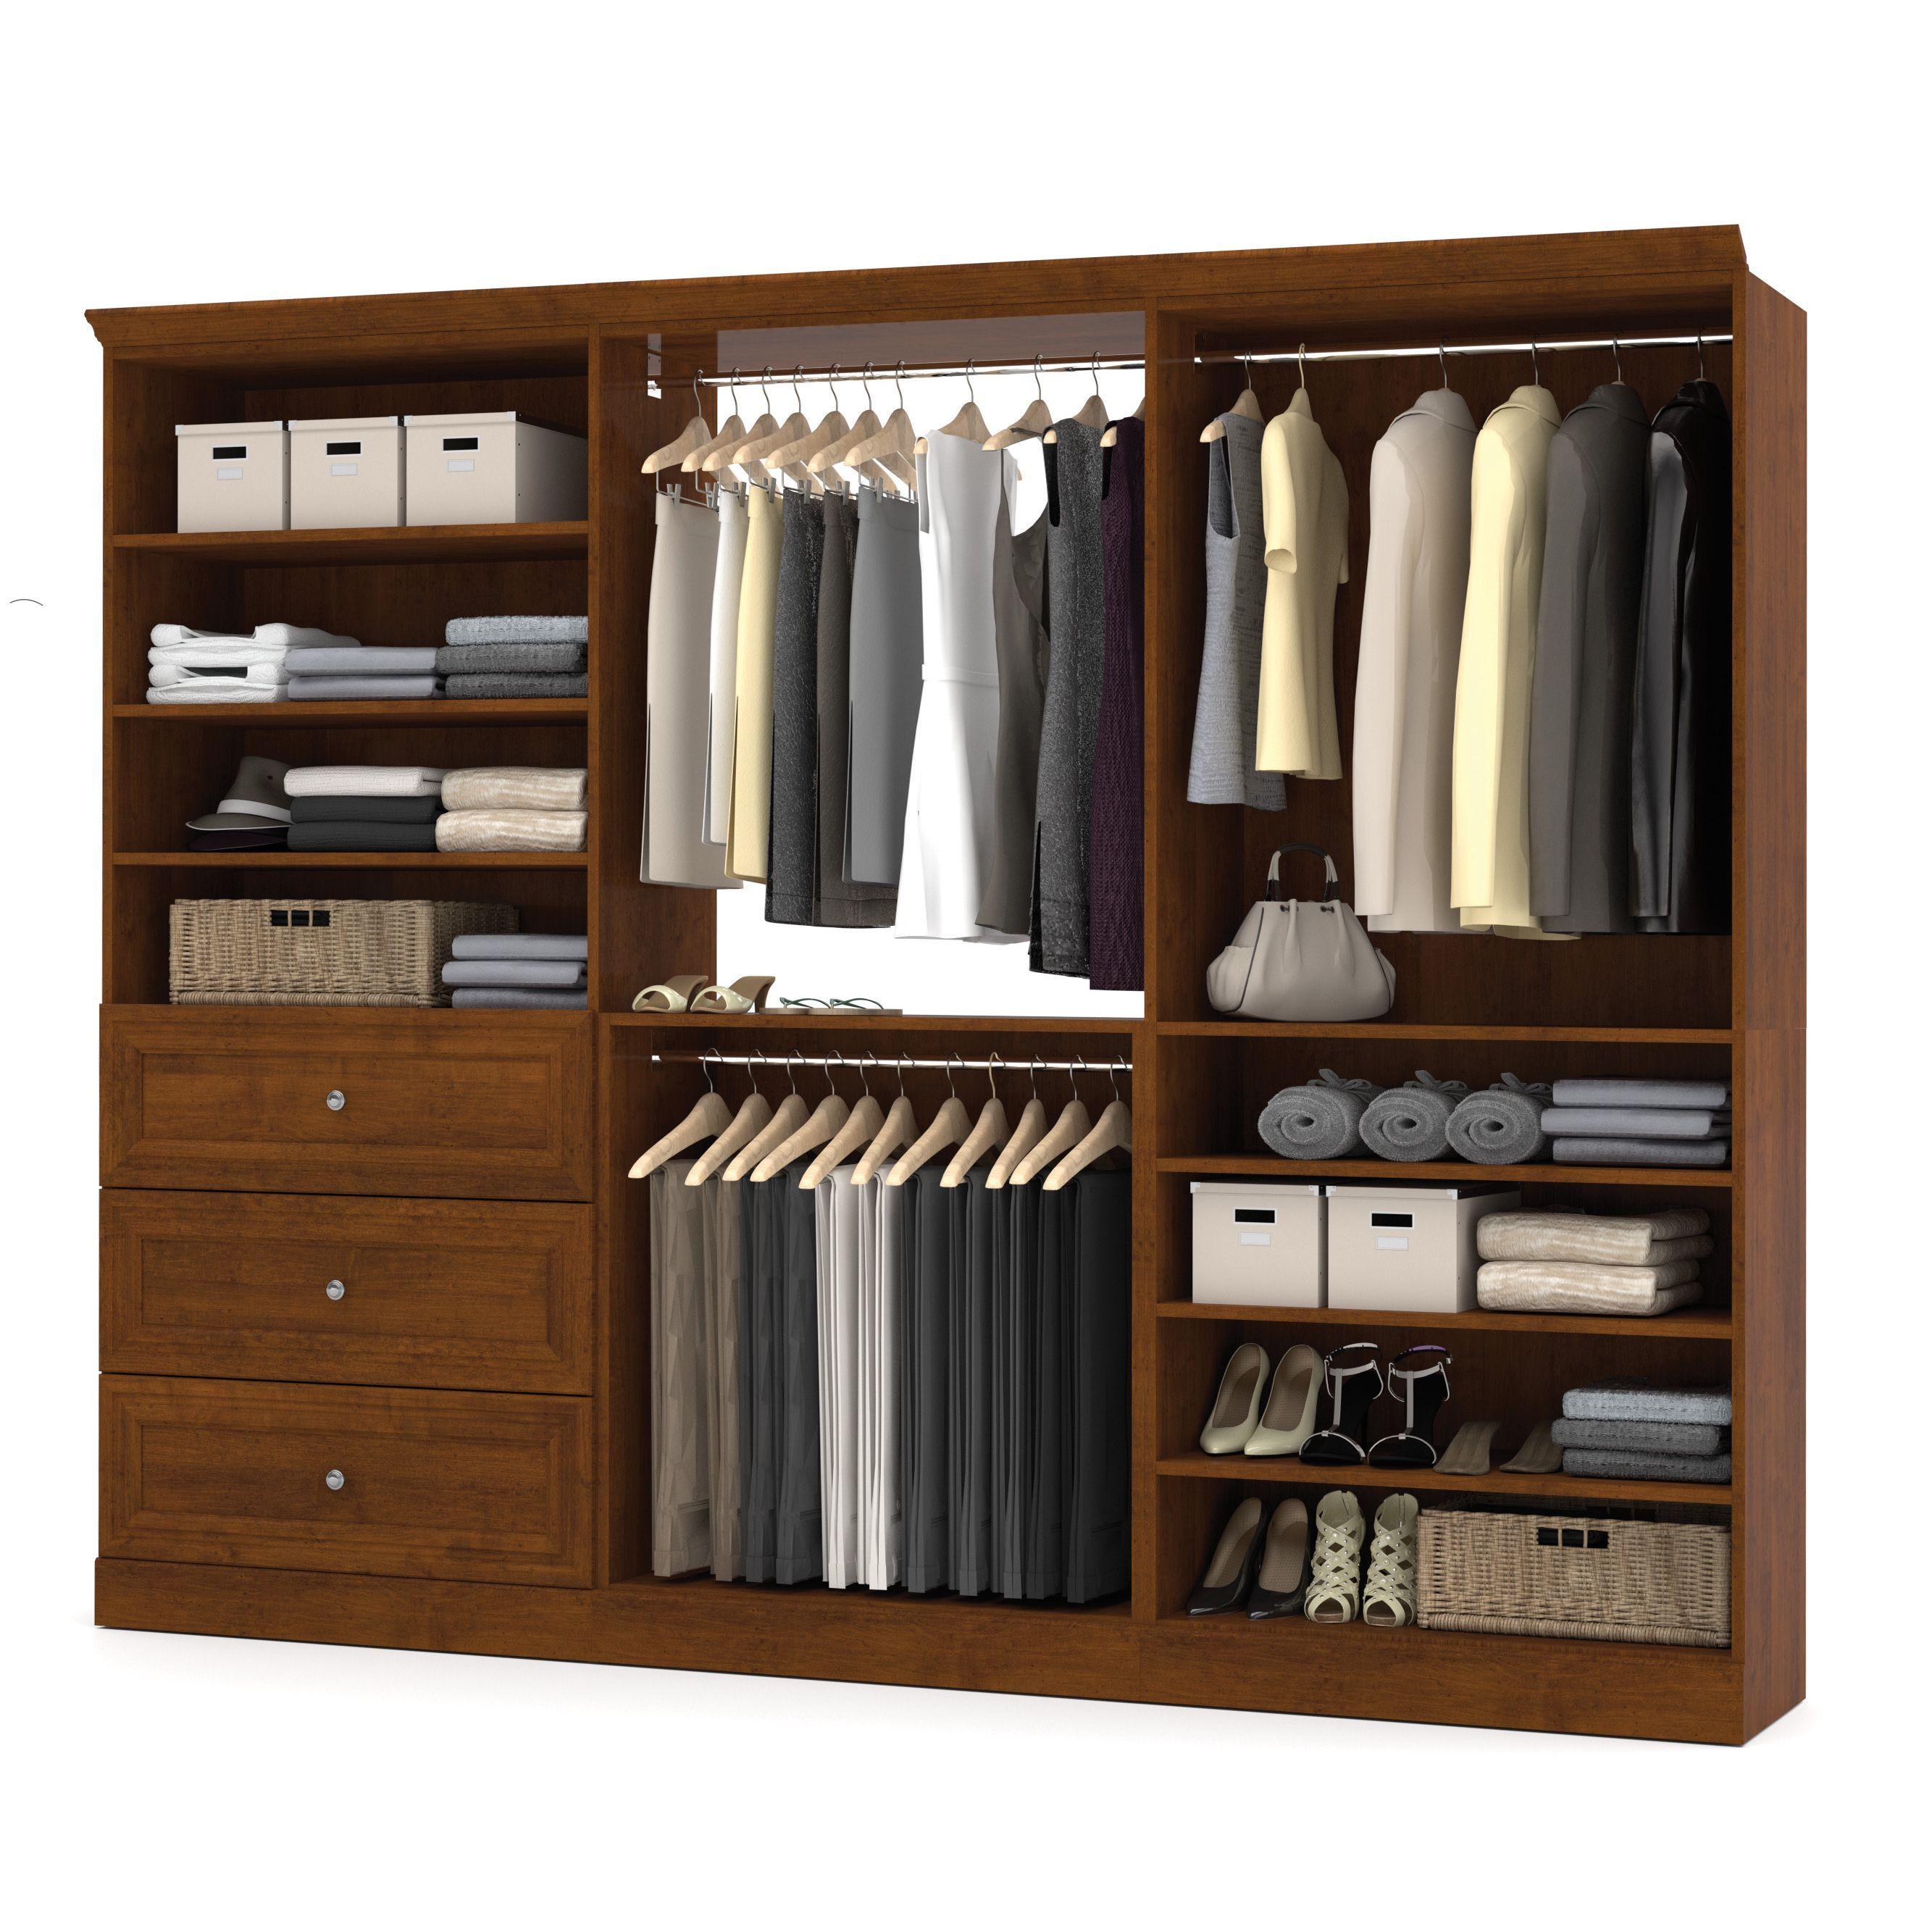 Online Shopping Bedding Furniture Electronics Jewelry Clothing More Closet System Closet Designs Closet Storage